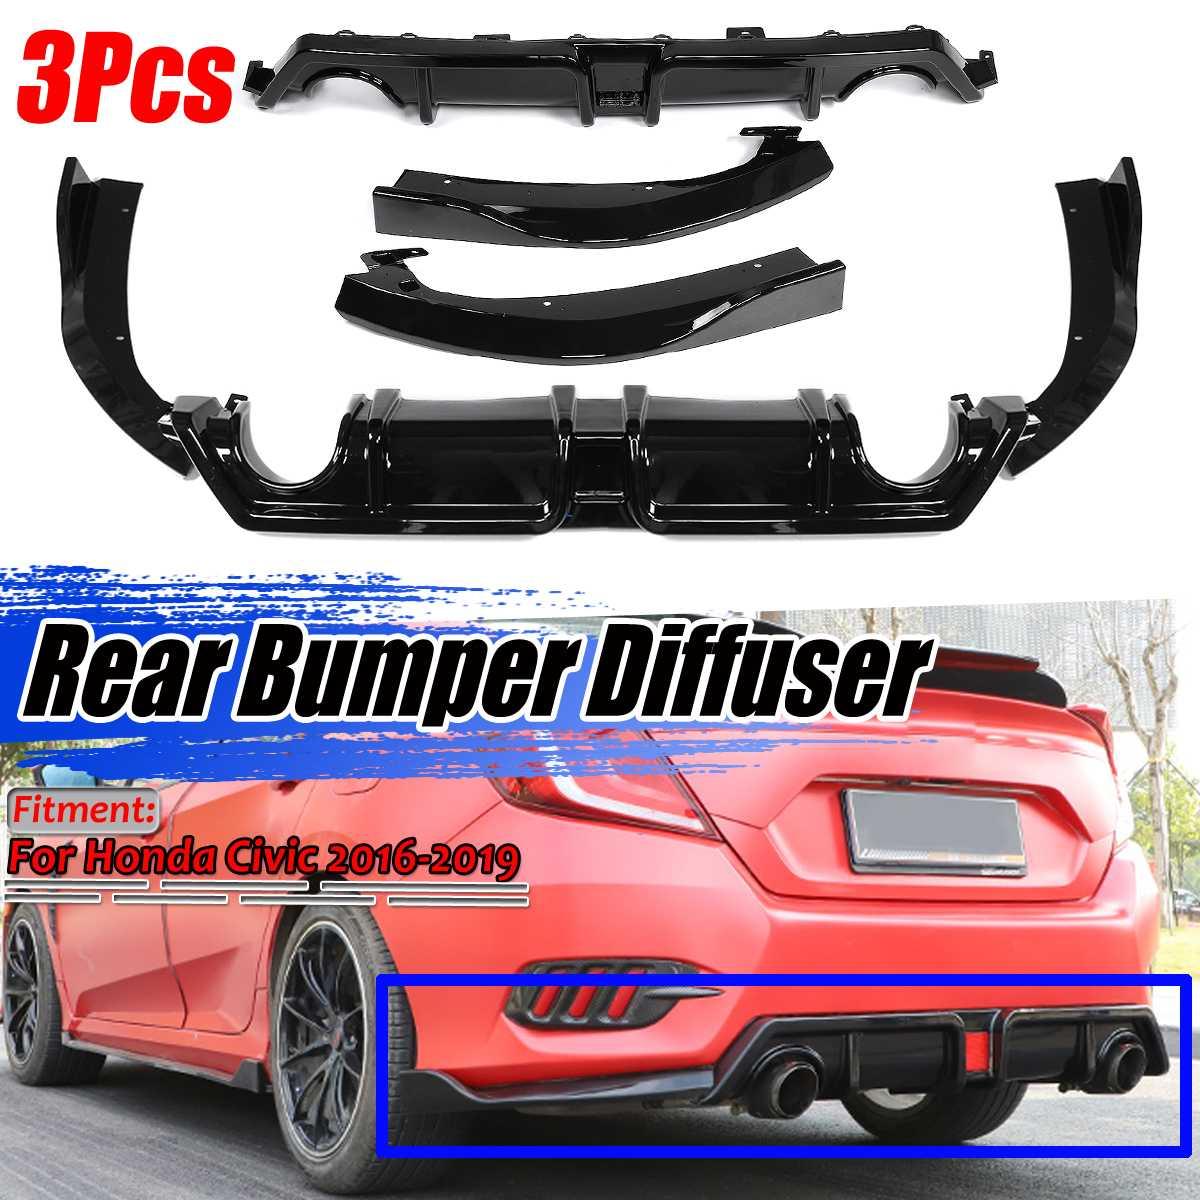 New 3Pcs Carbon Fiber Look / Black Car Rear Bumper Diffuser Splitter Lip Spolier Guard Protection For Honda For Civic 2016-2019